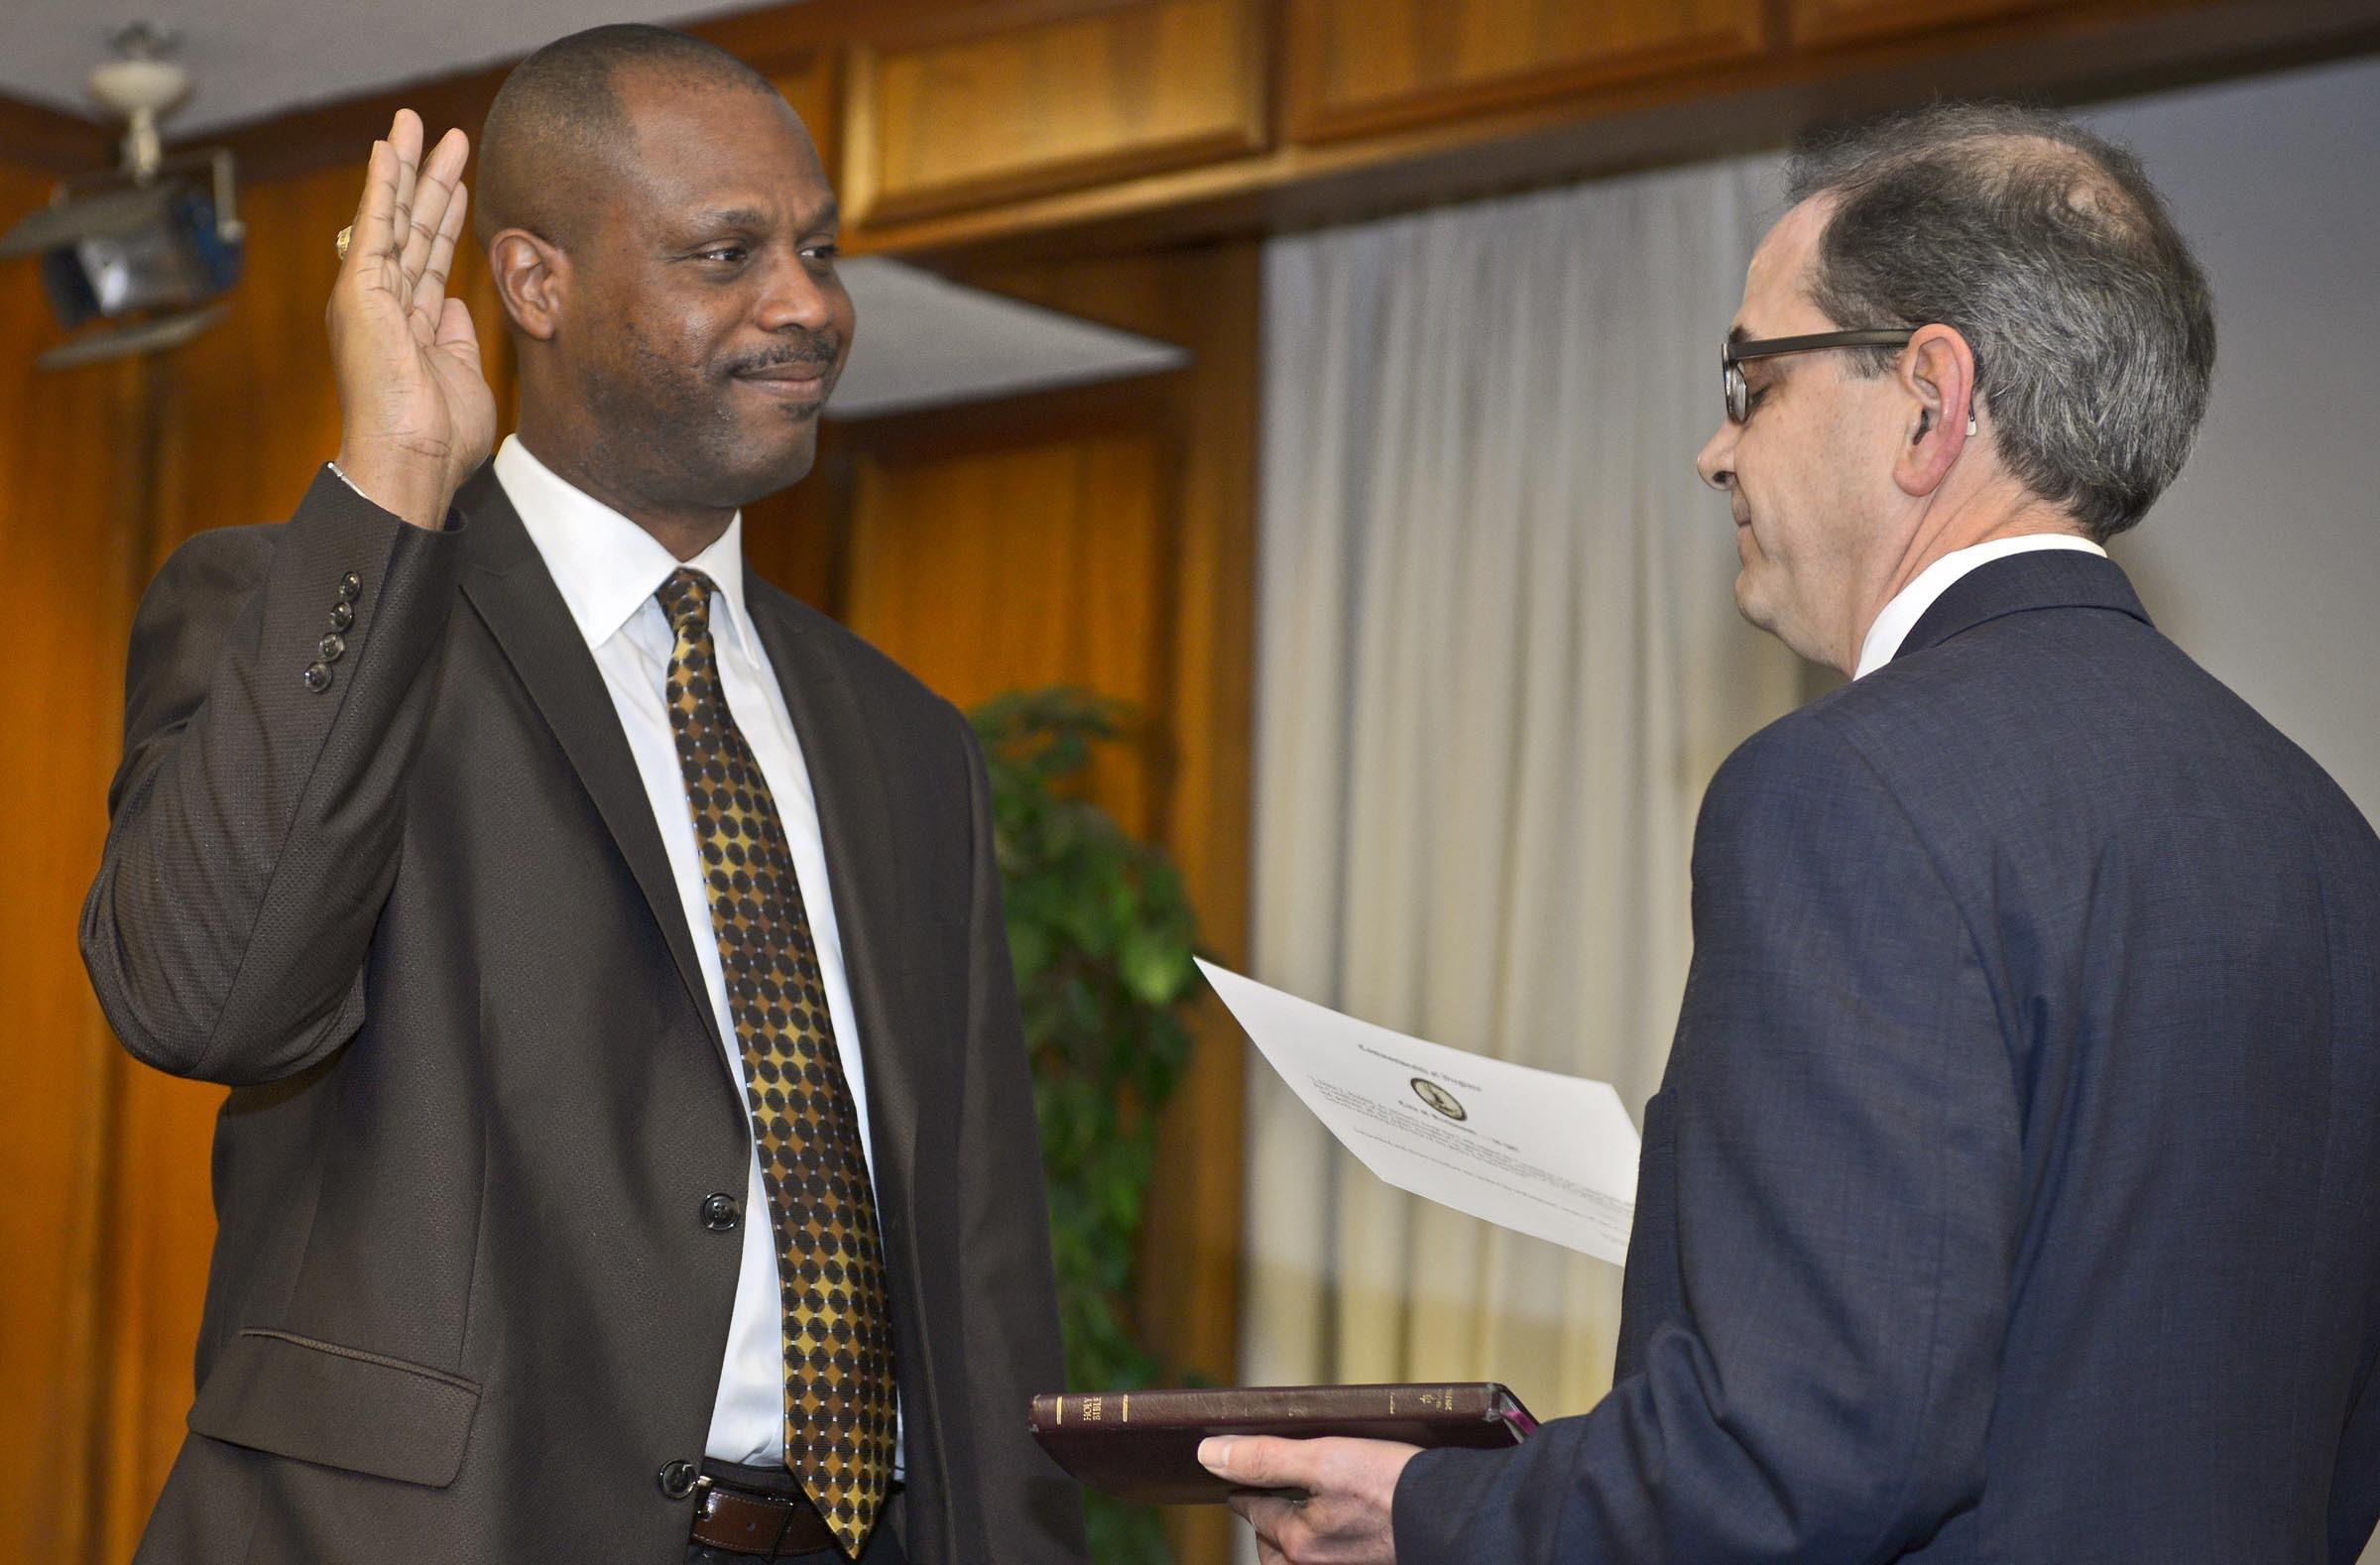 Richmond School Superintendent Dana Bedden is sworn into office at City Hall on Jan. 13. - ASH DANIEL